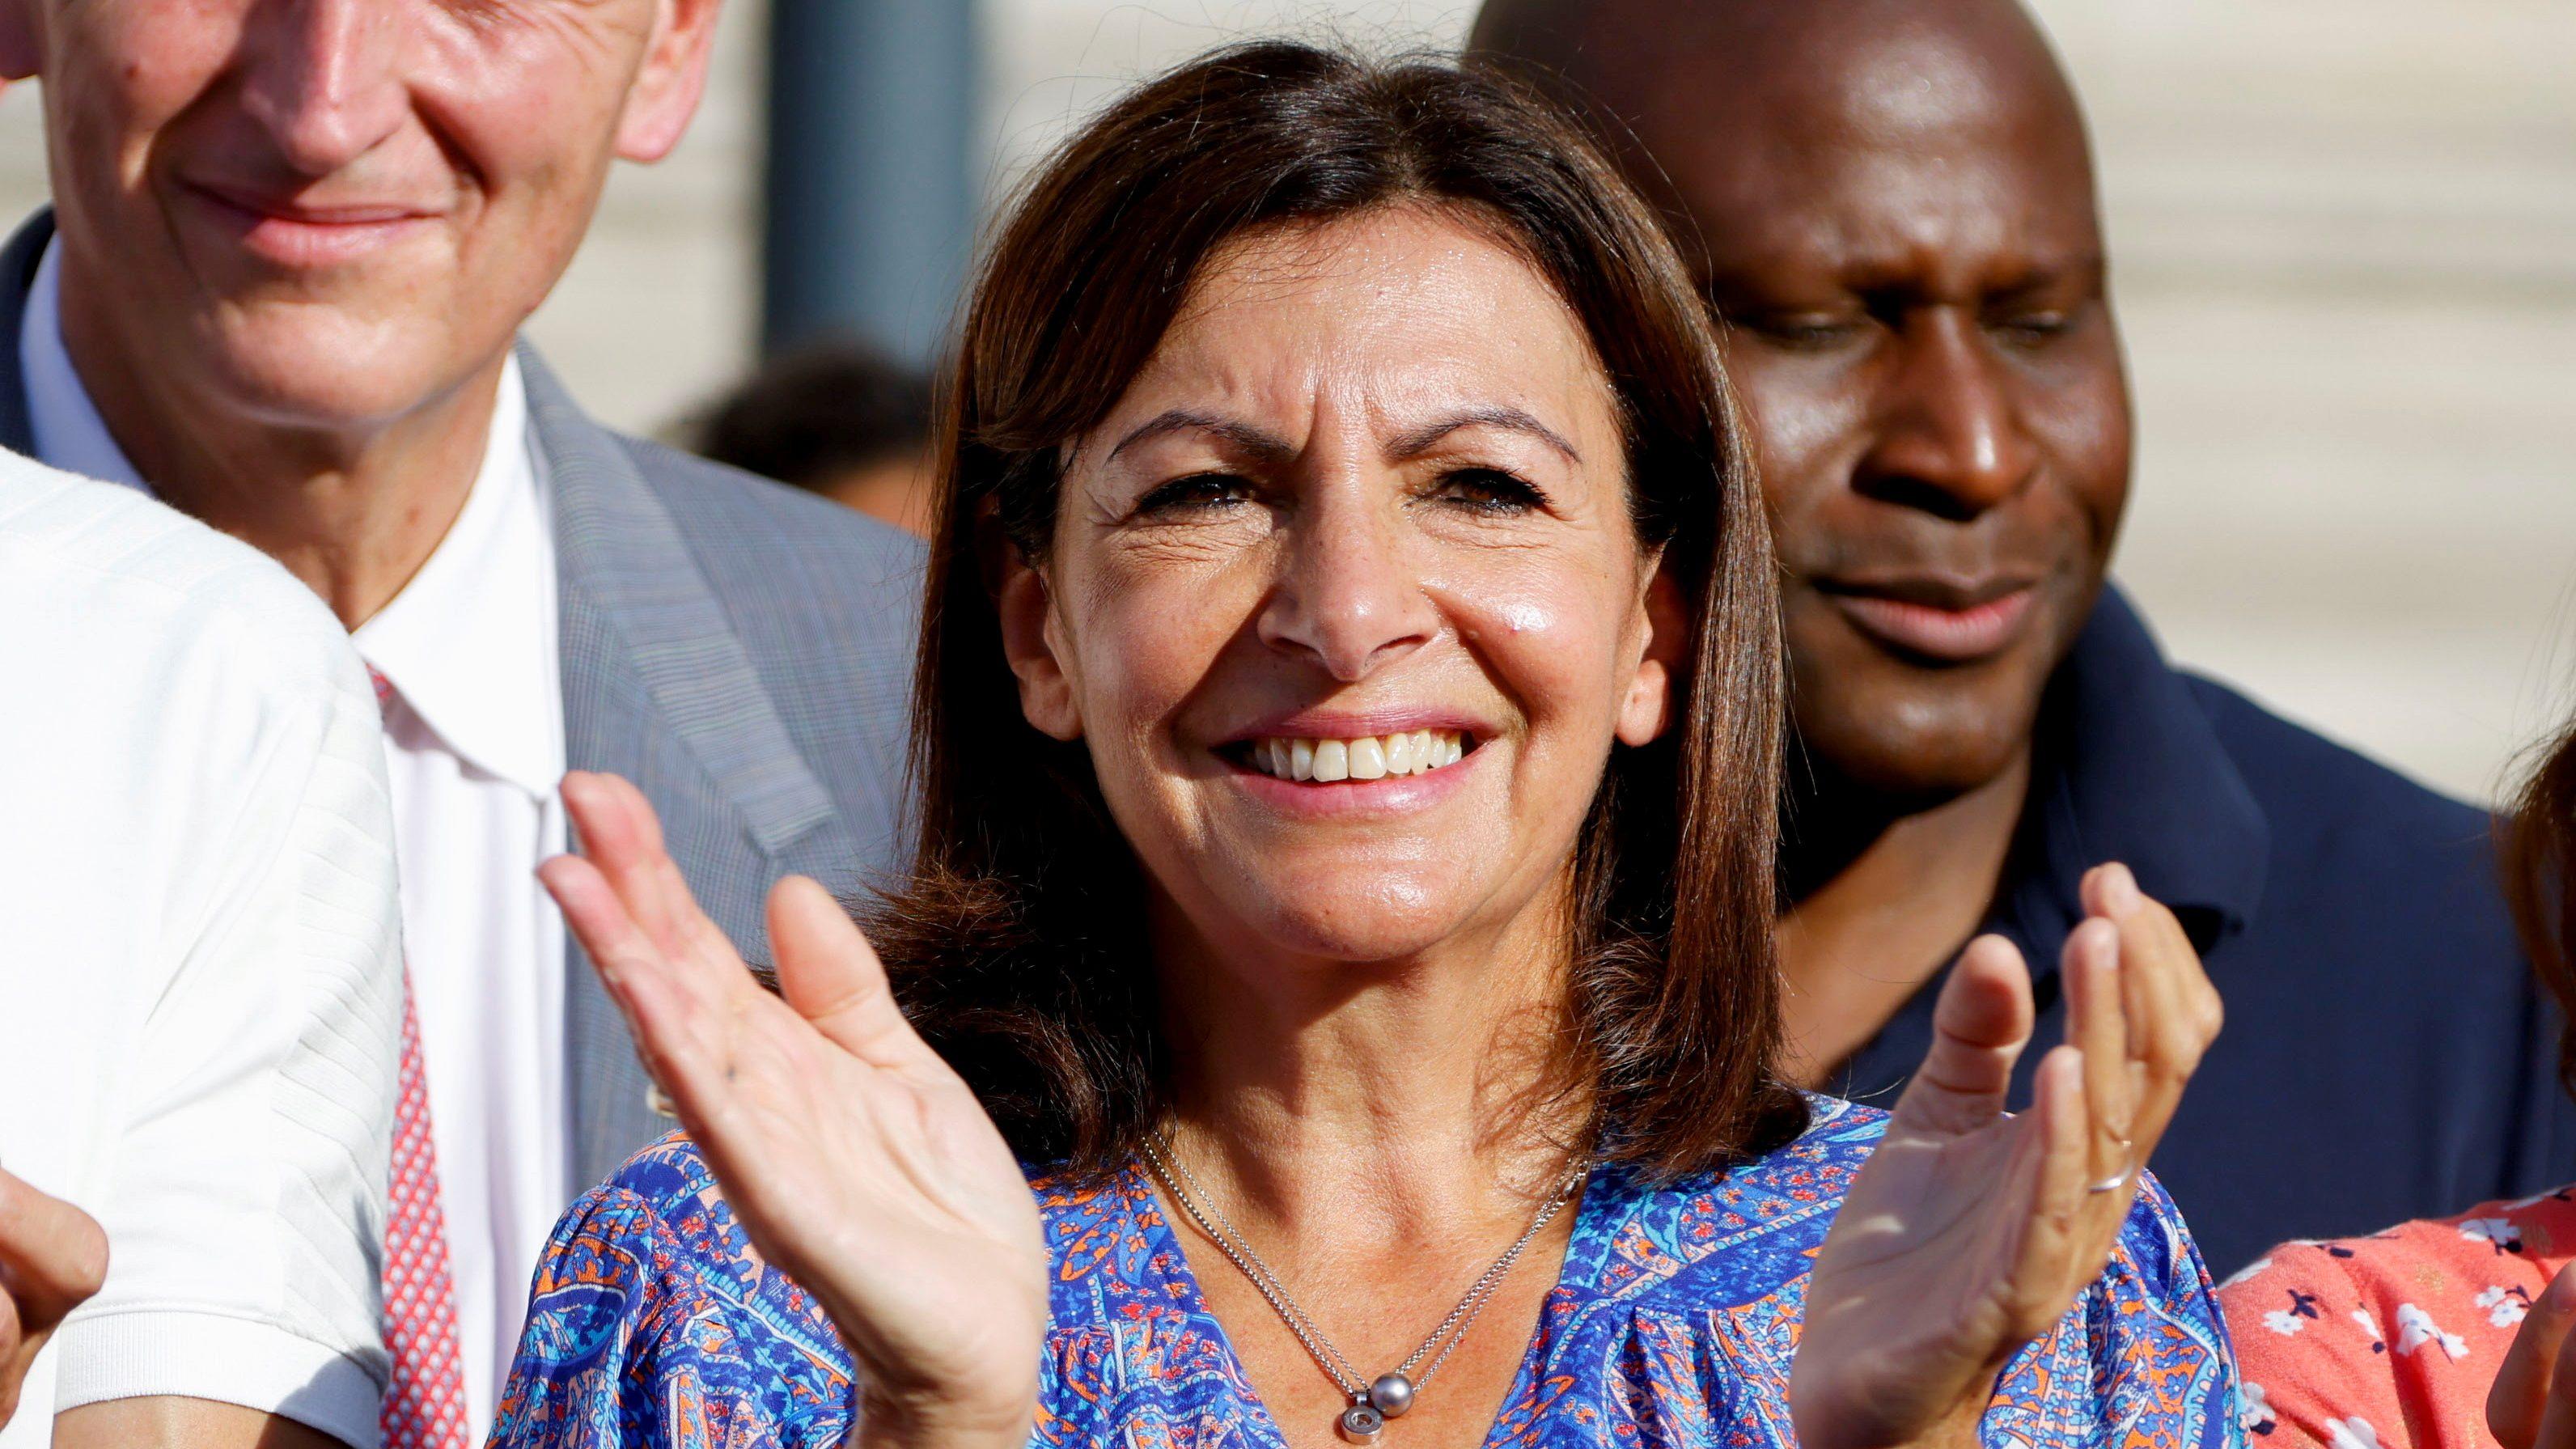 Paris Mayor Anne Hidalgo seen applauding at a public event